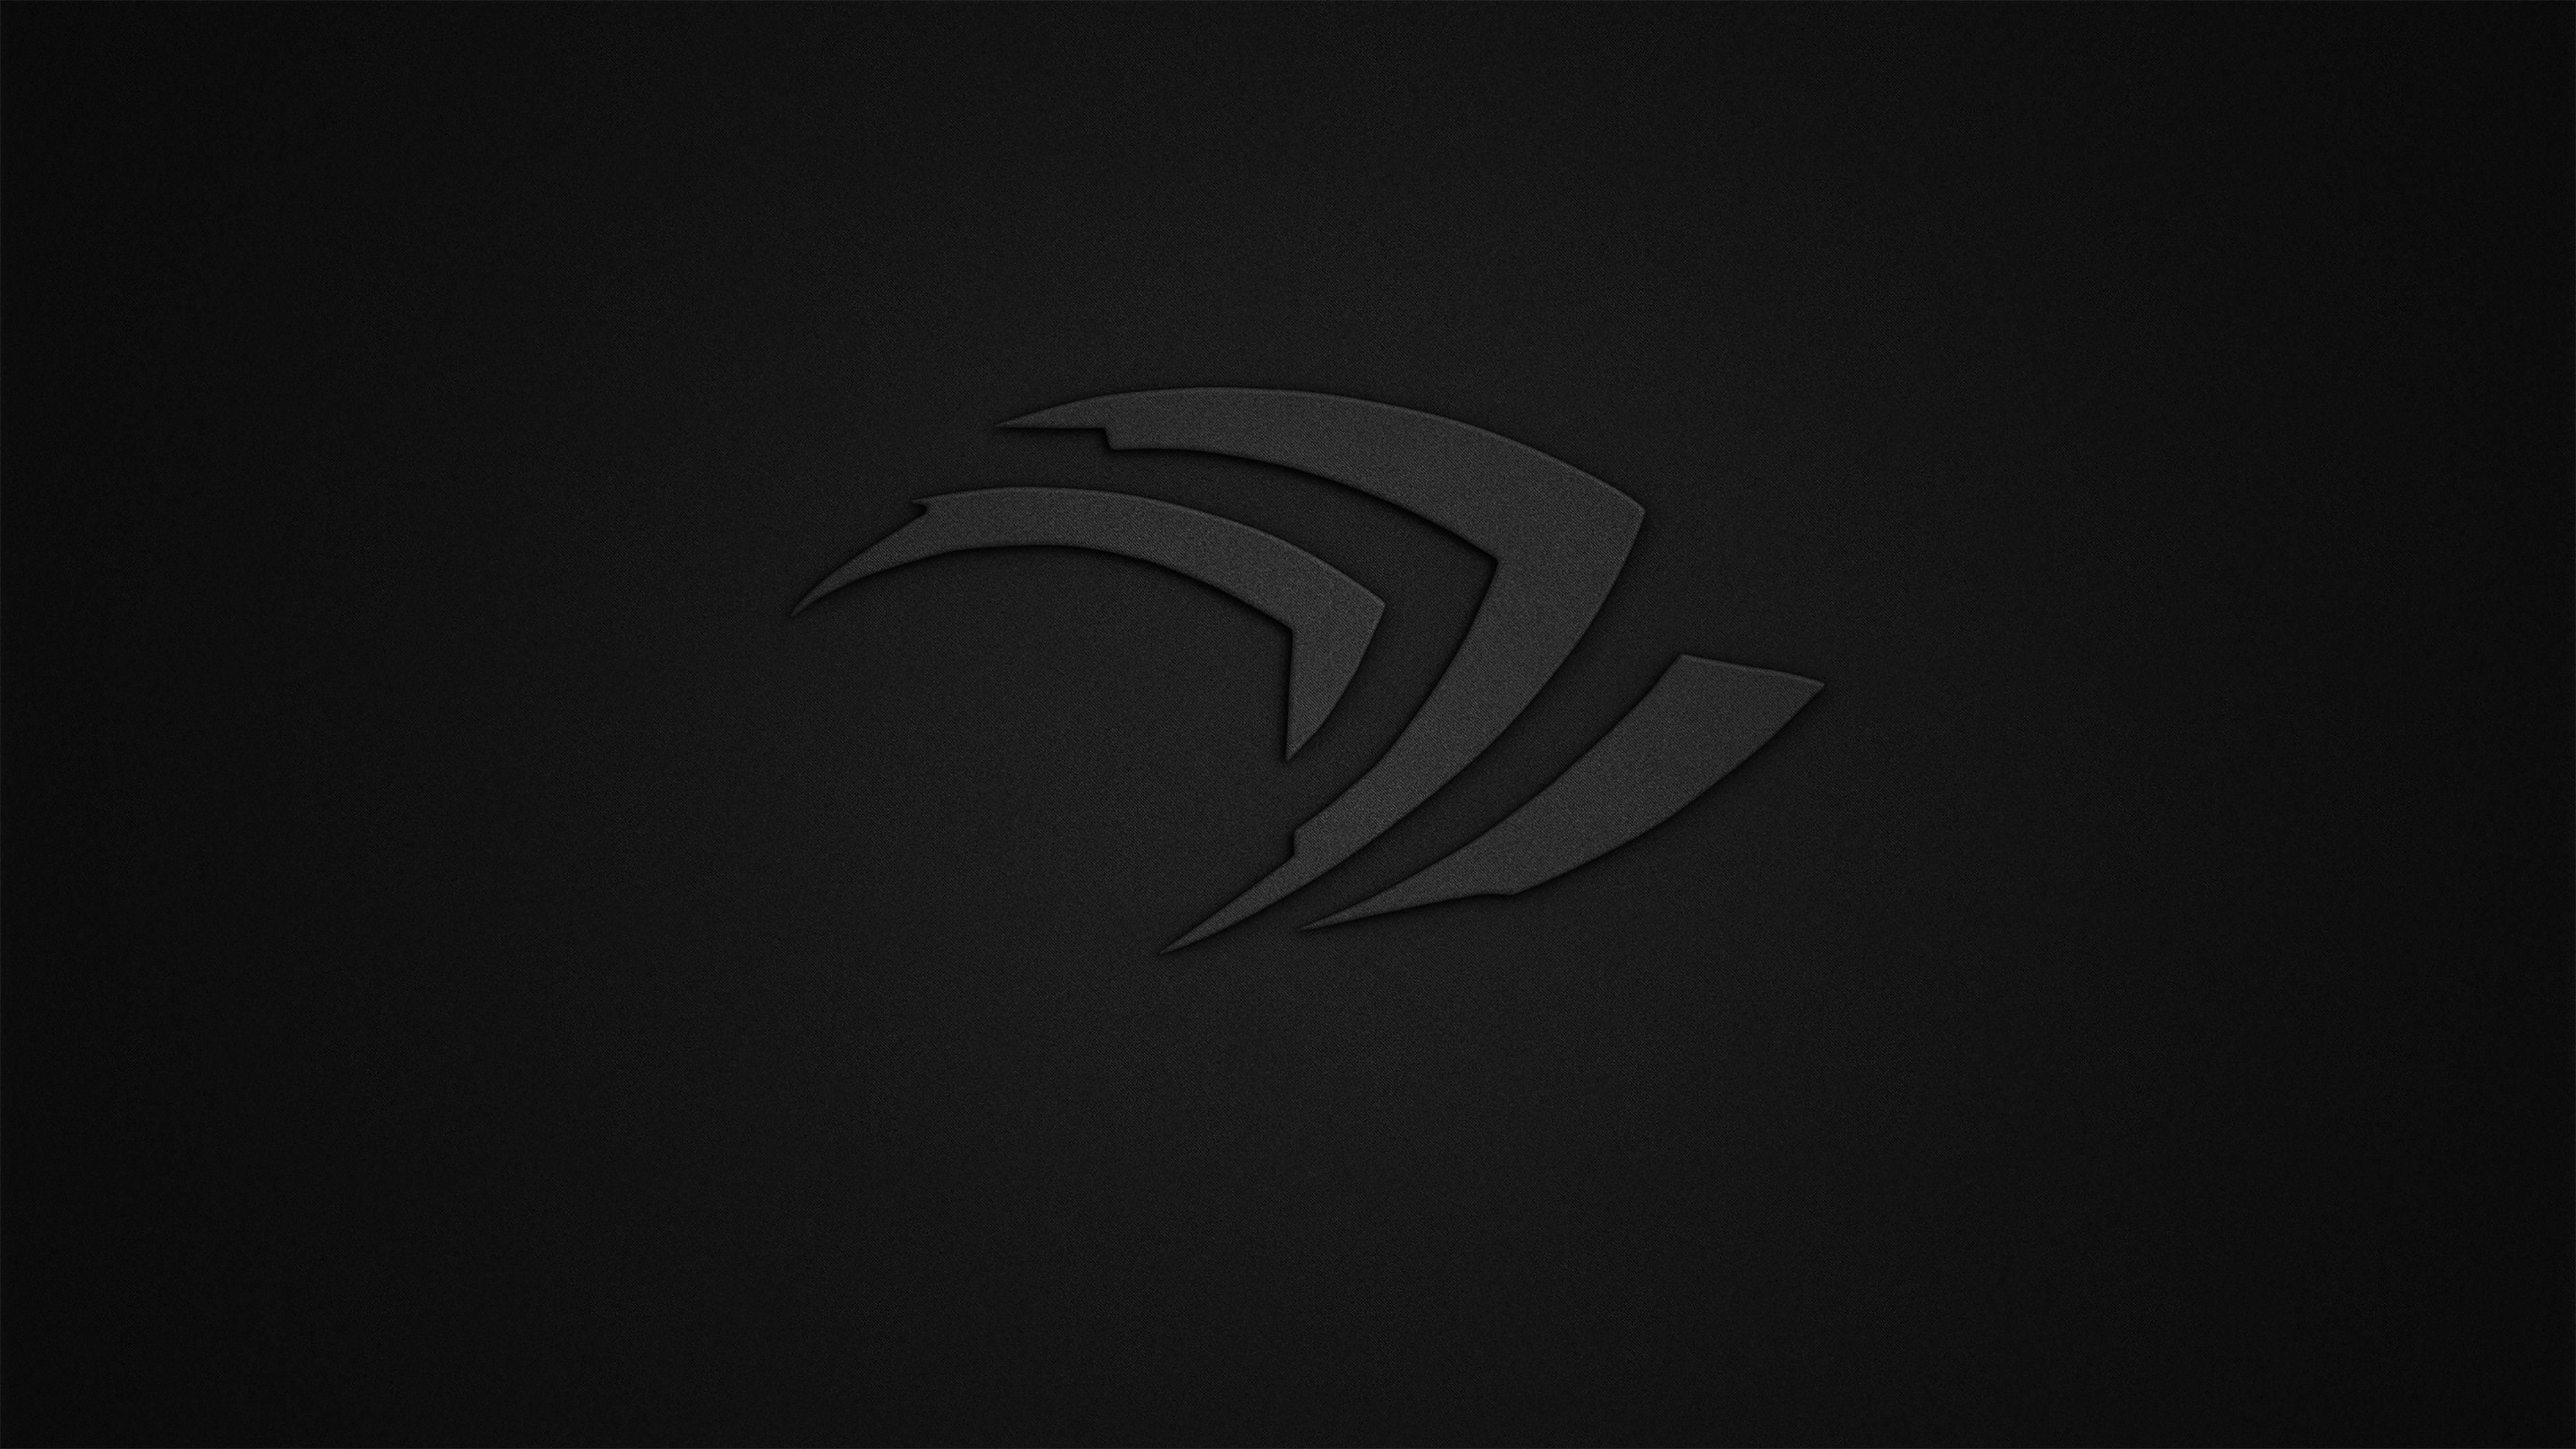 Res 3840x2160 Nvidia 4k Wallpaper Picture Logo Nvidia Monochrome